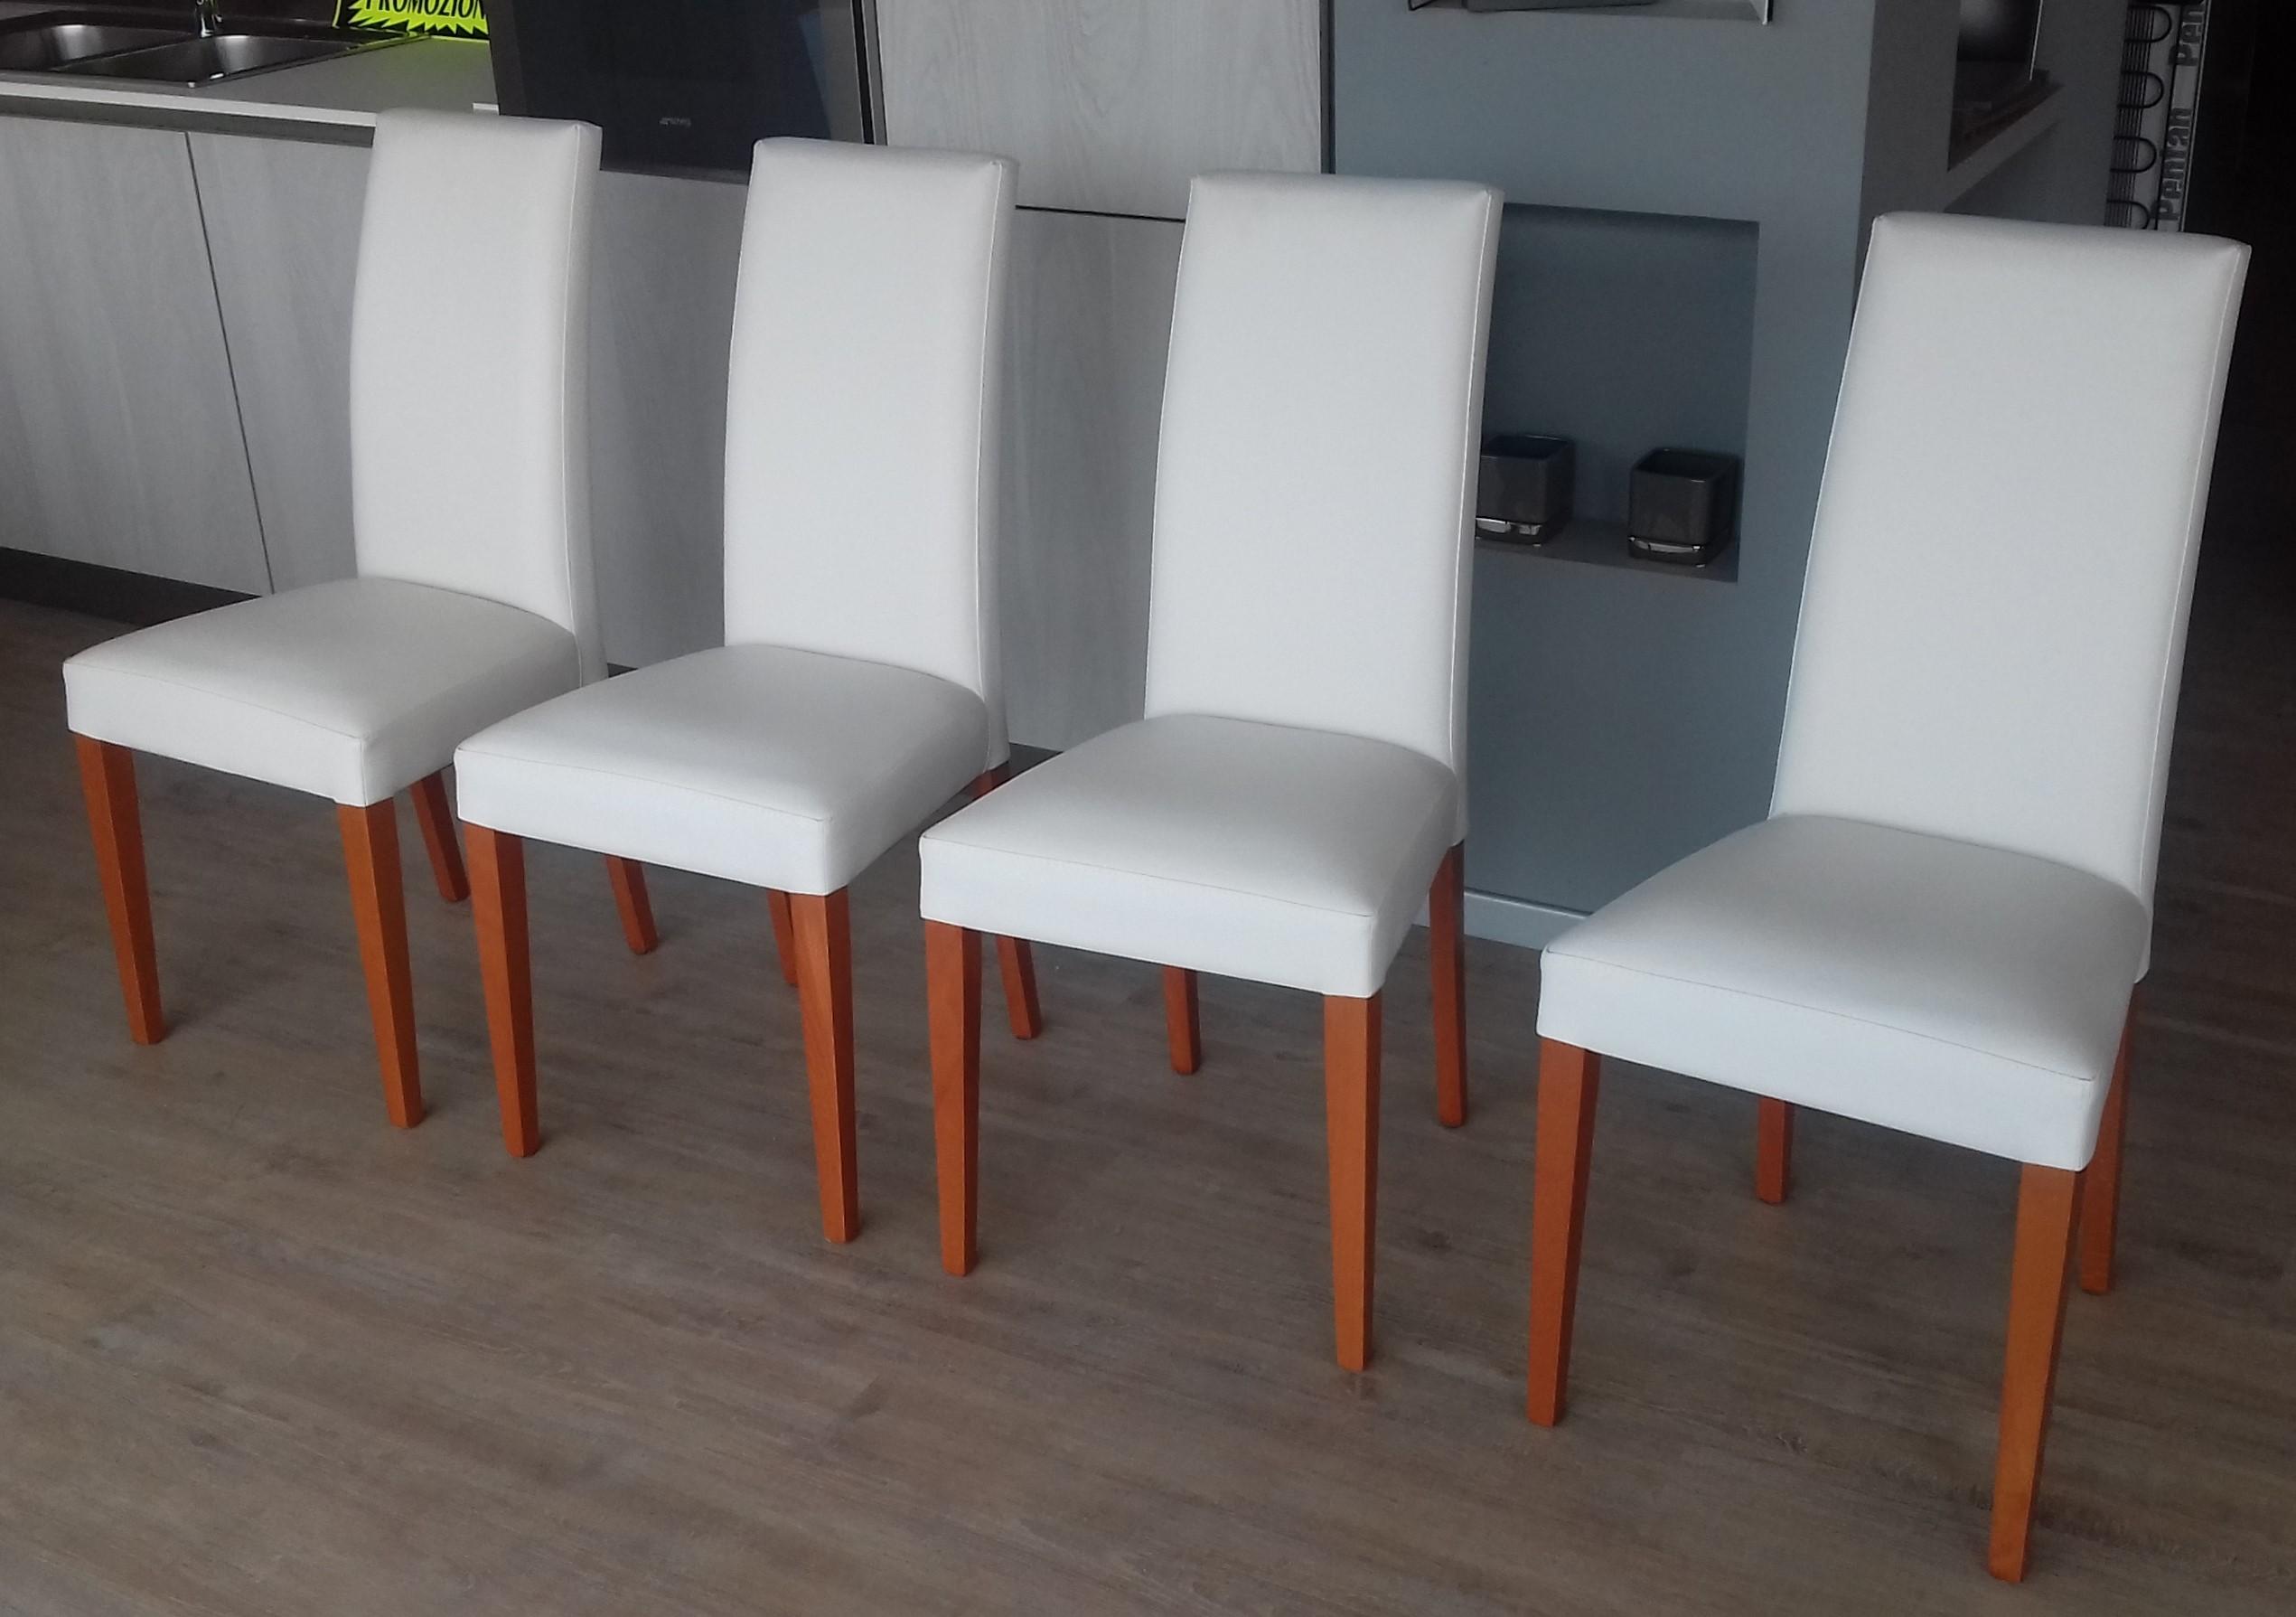 Sedie da cucina in legno imbottite: sedie ikea guida alla scelta